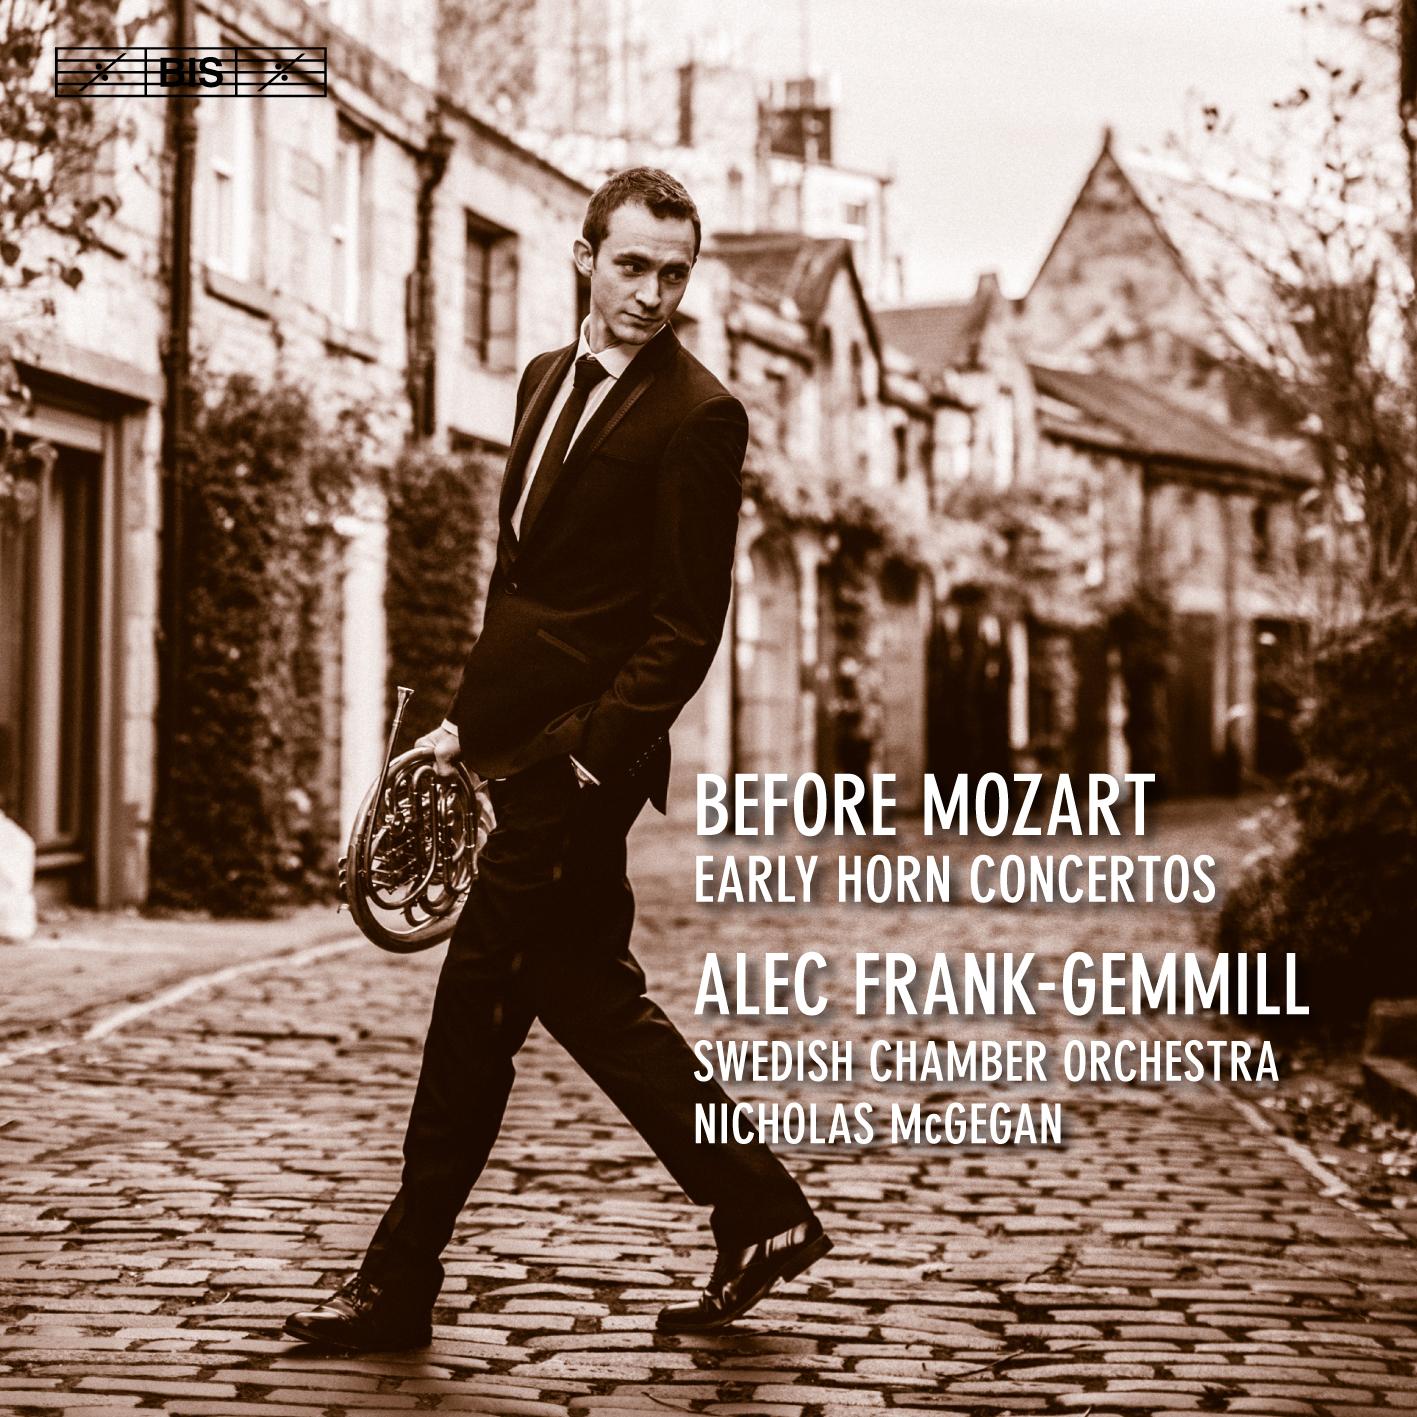 alec frank gemmill early horn concertos mozart